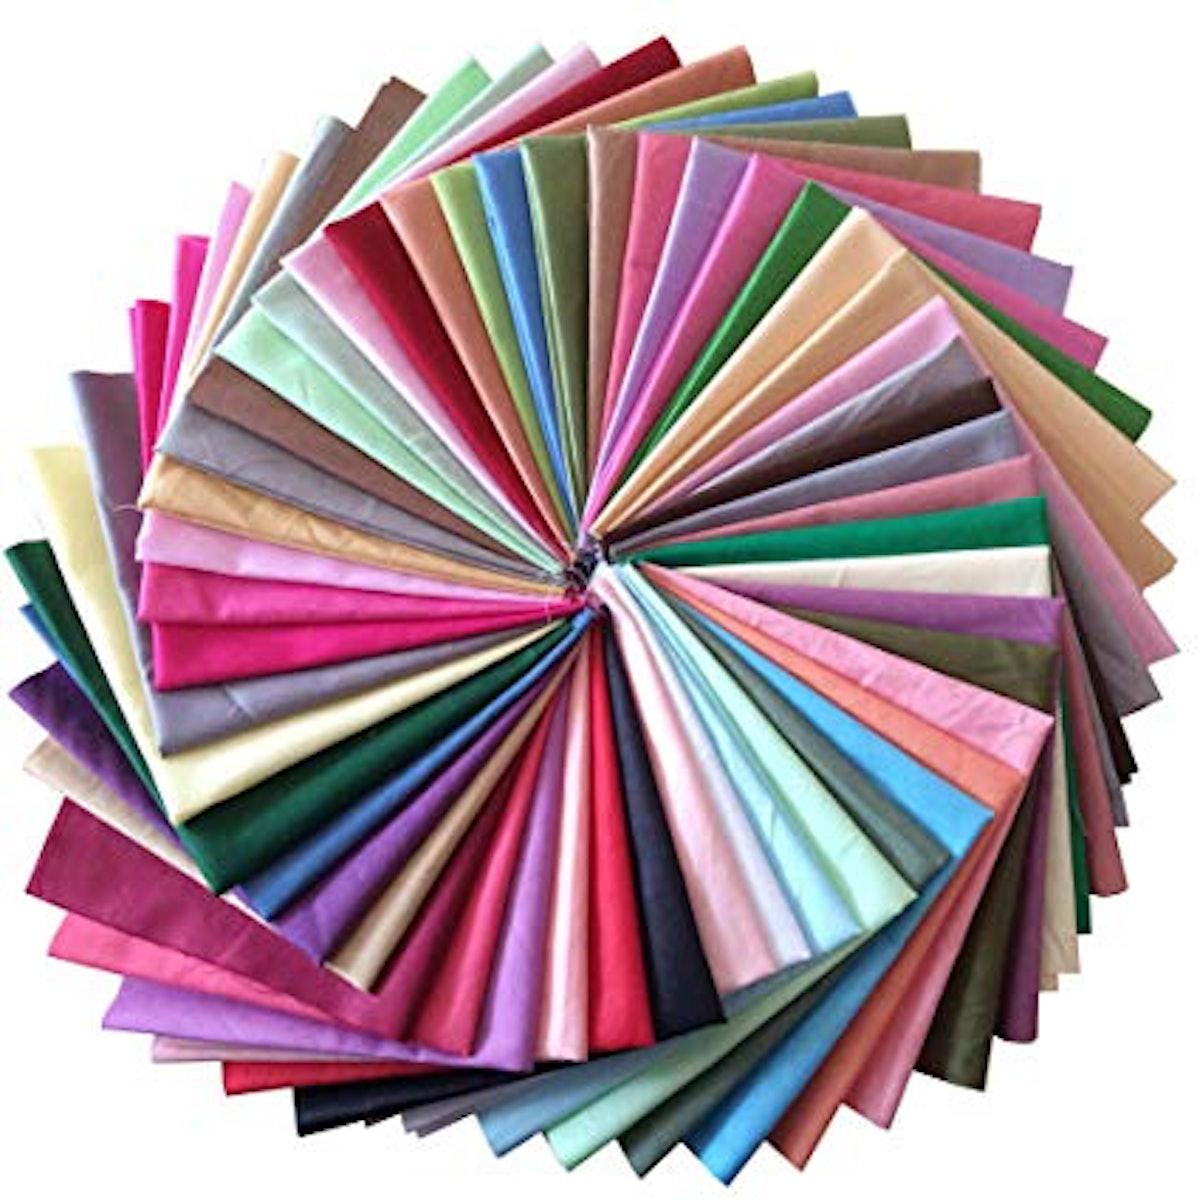 longshine-us Premium Cotton Craft Fabric Bundle Squares